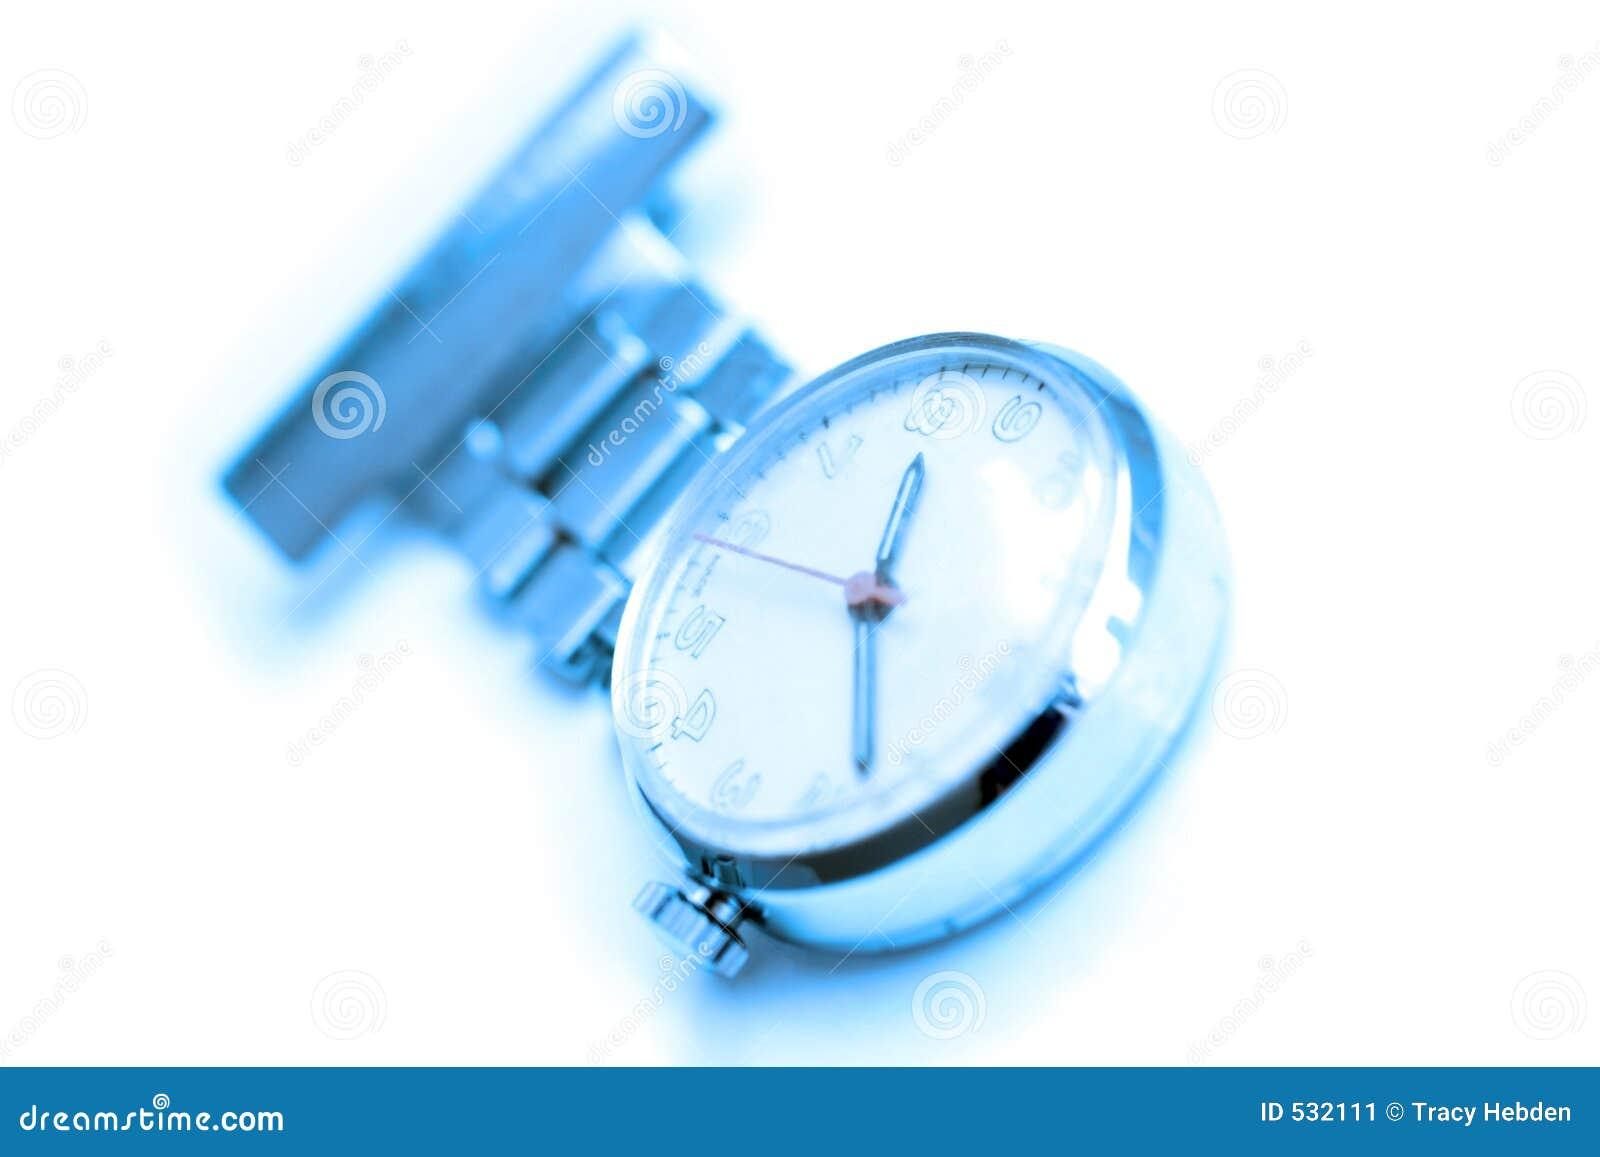 Download 离岸价格护士手表 库存图片. 图片 包括有 符号, 医疗, 紧急, 交叉, 专用, 人员, autoworker - 532111